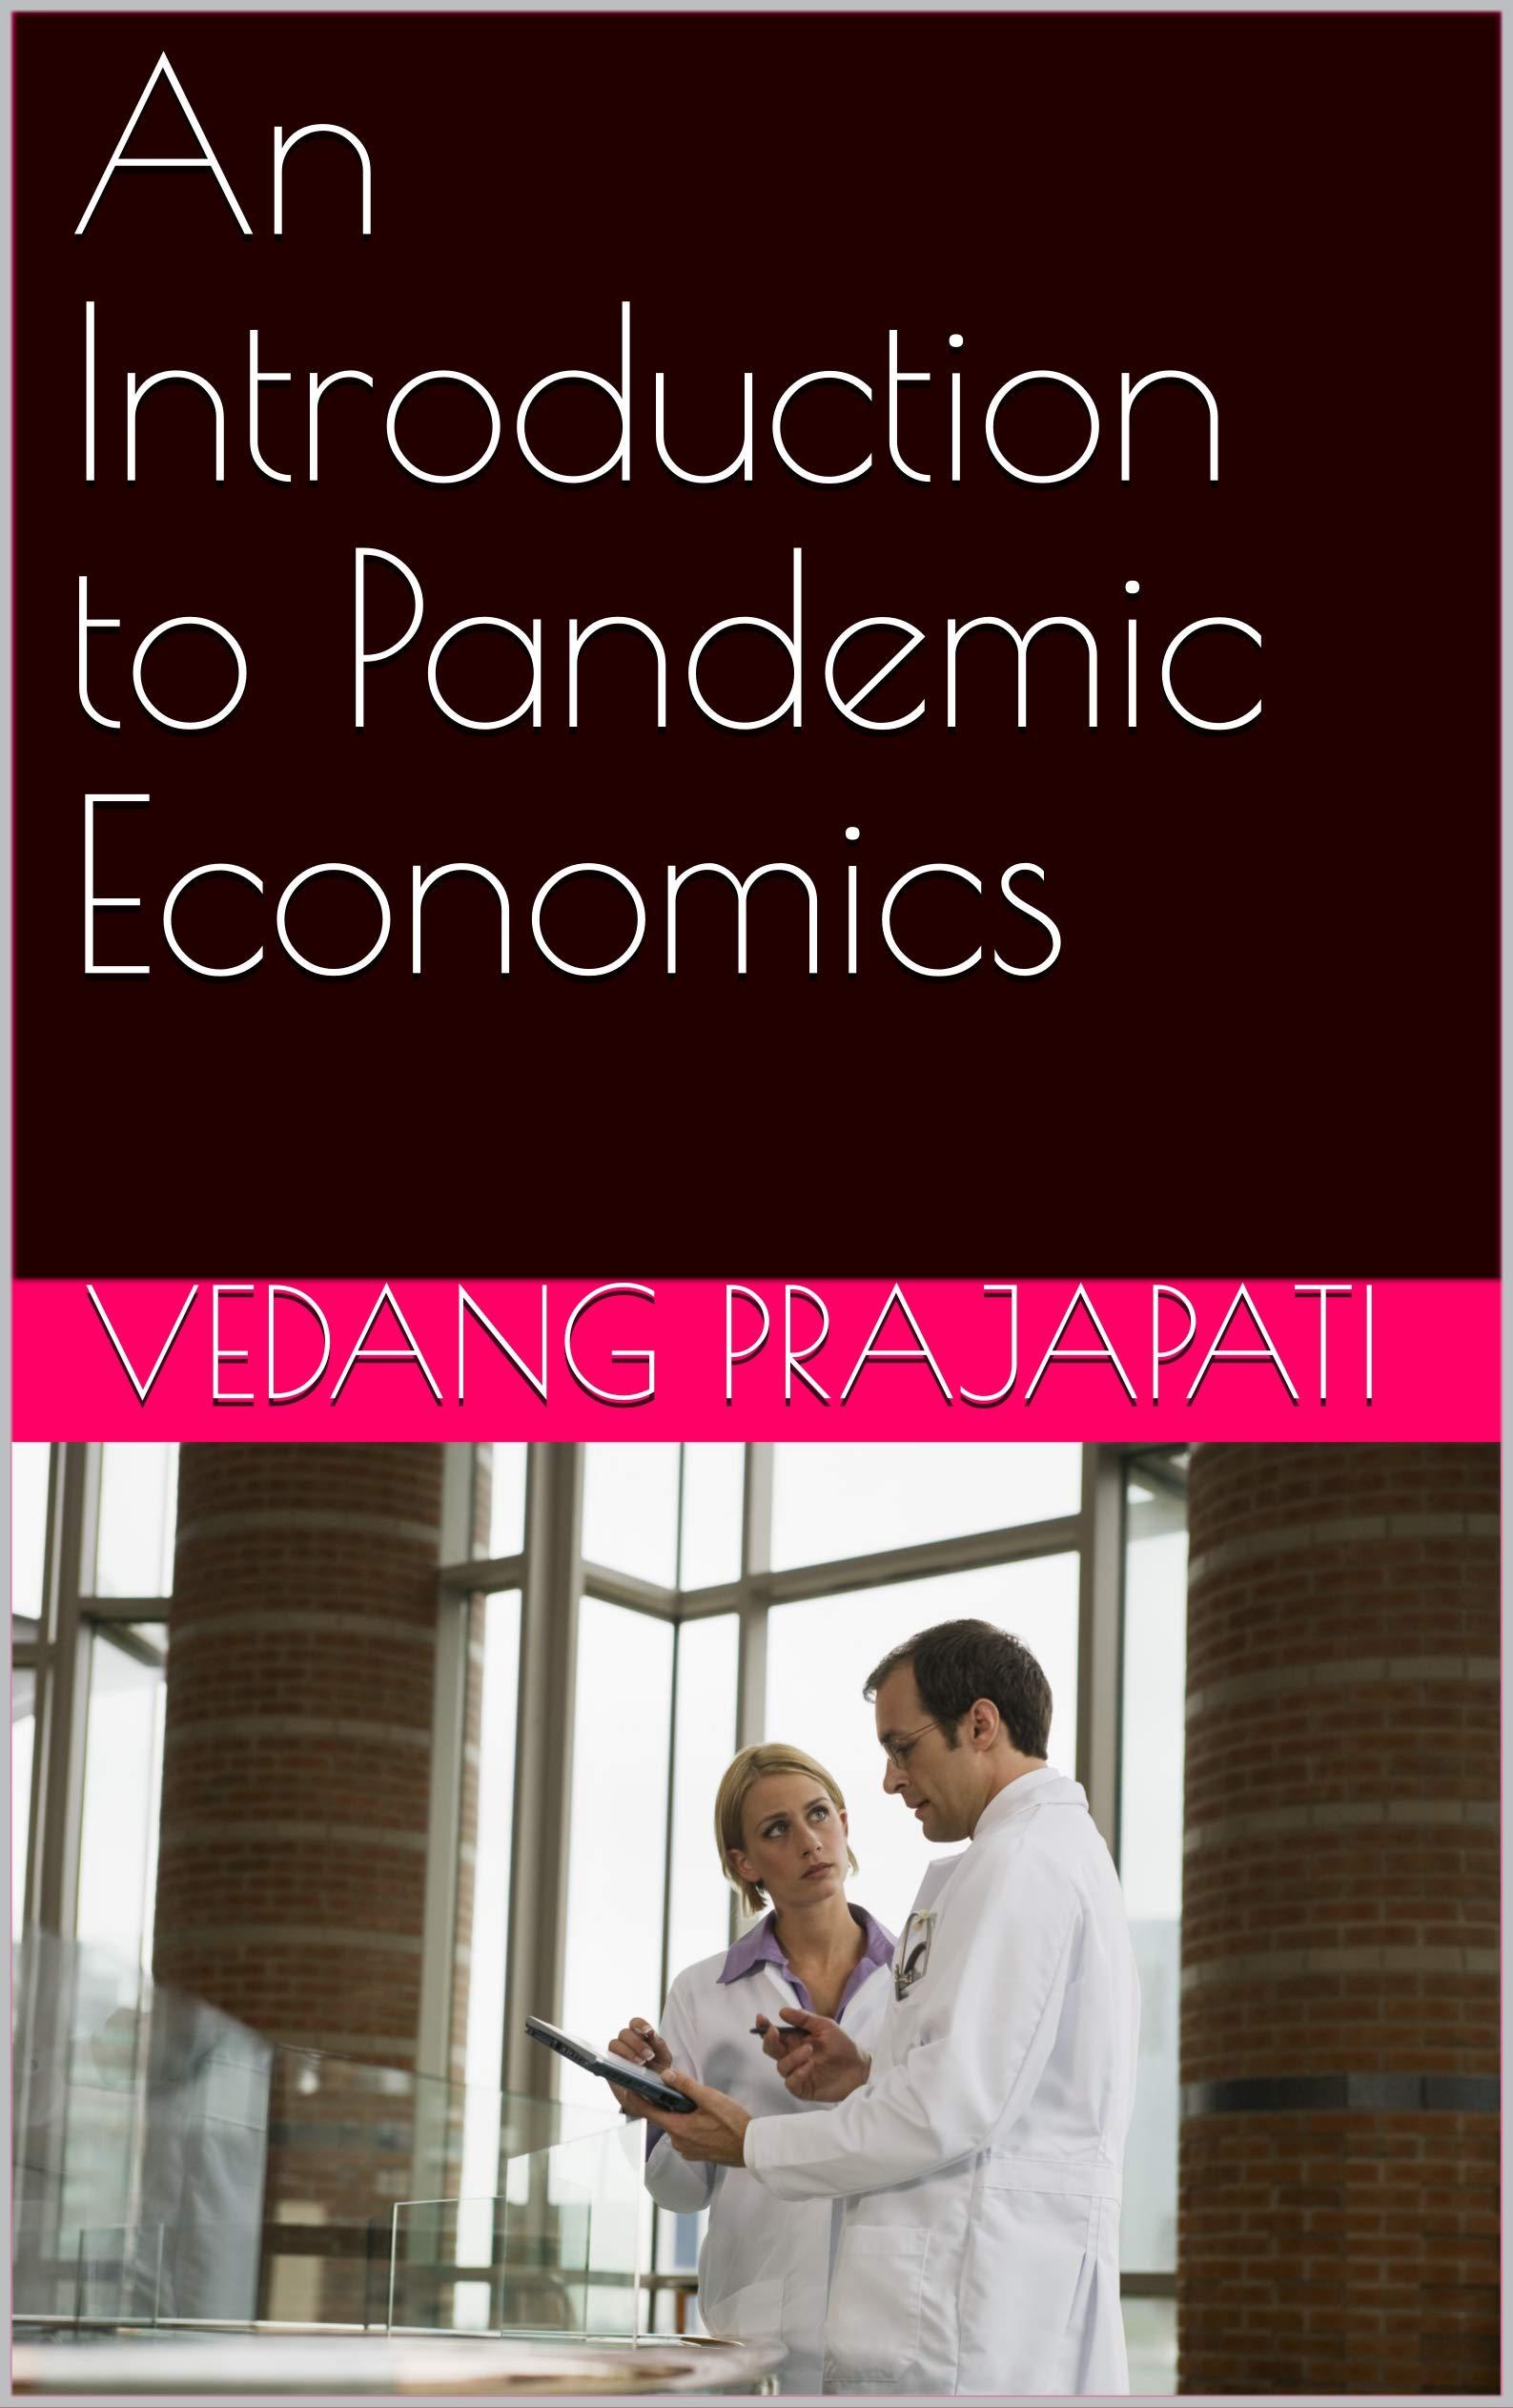 An Introduction to Pandemic Economics